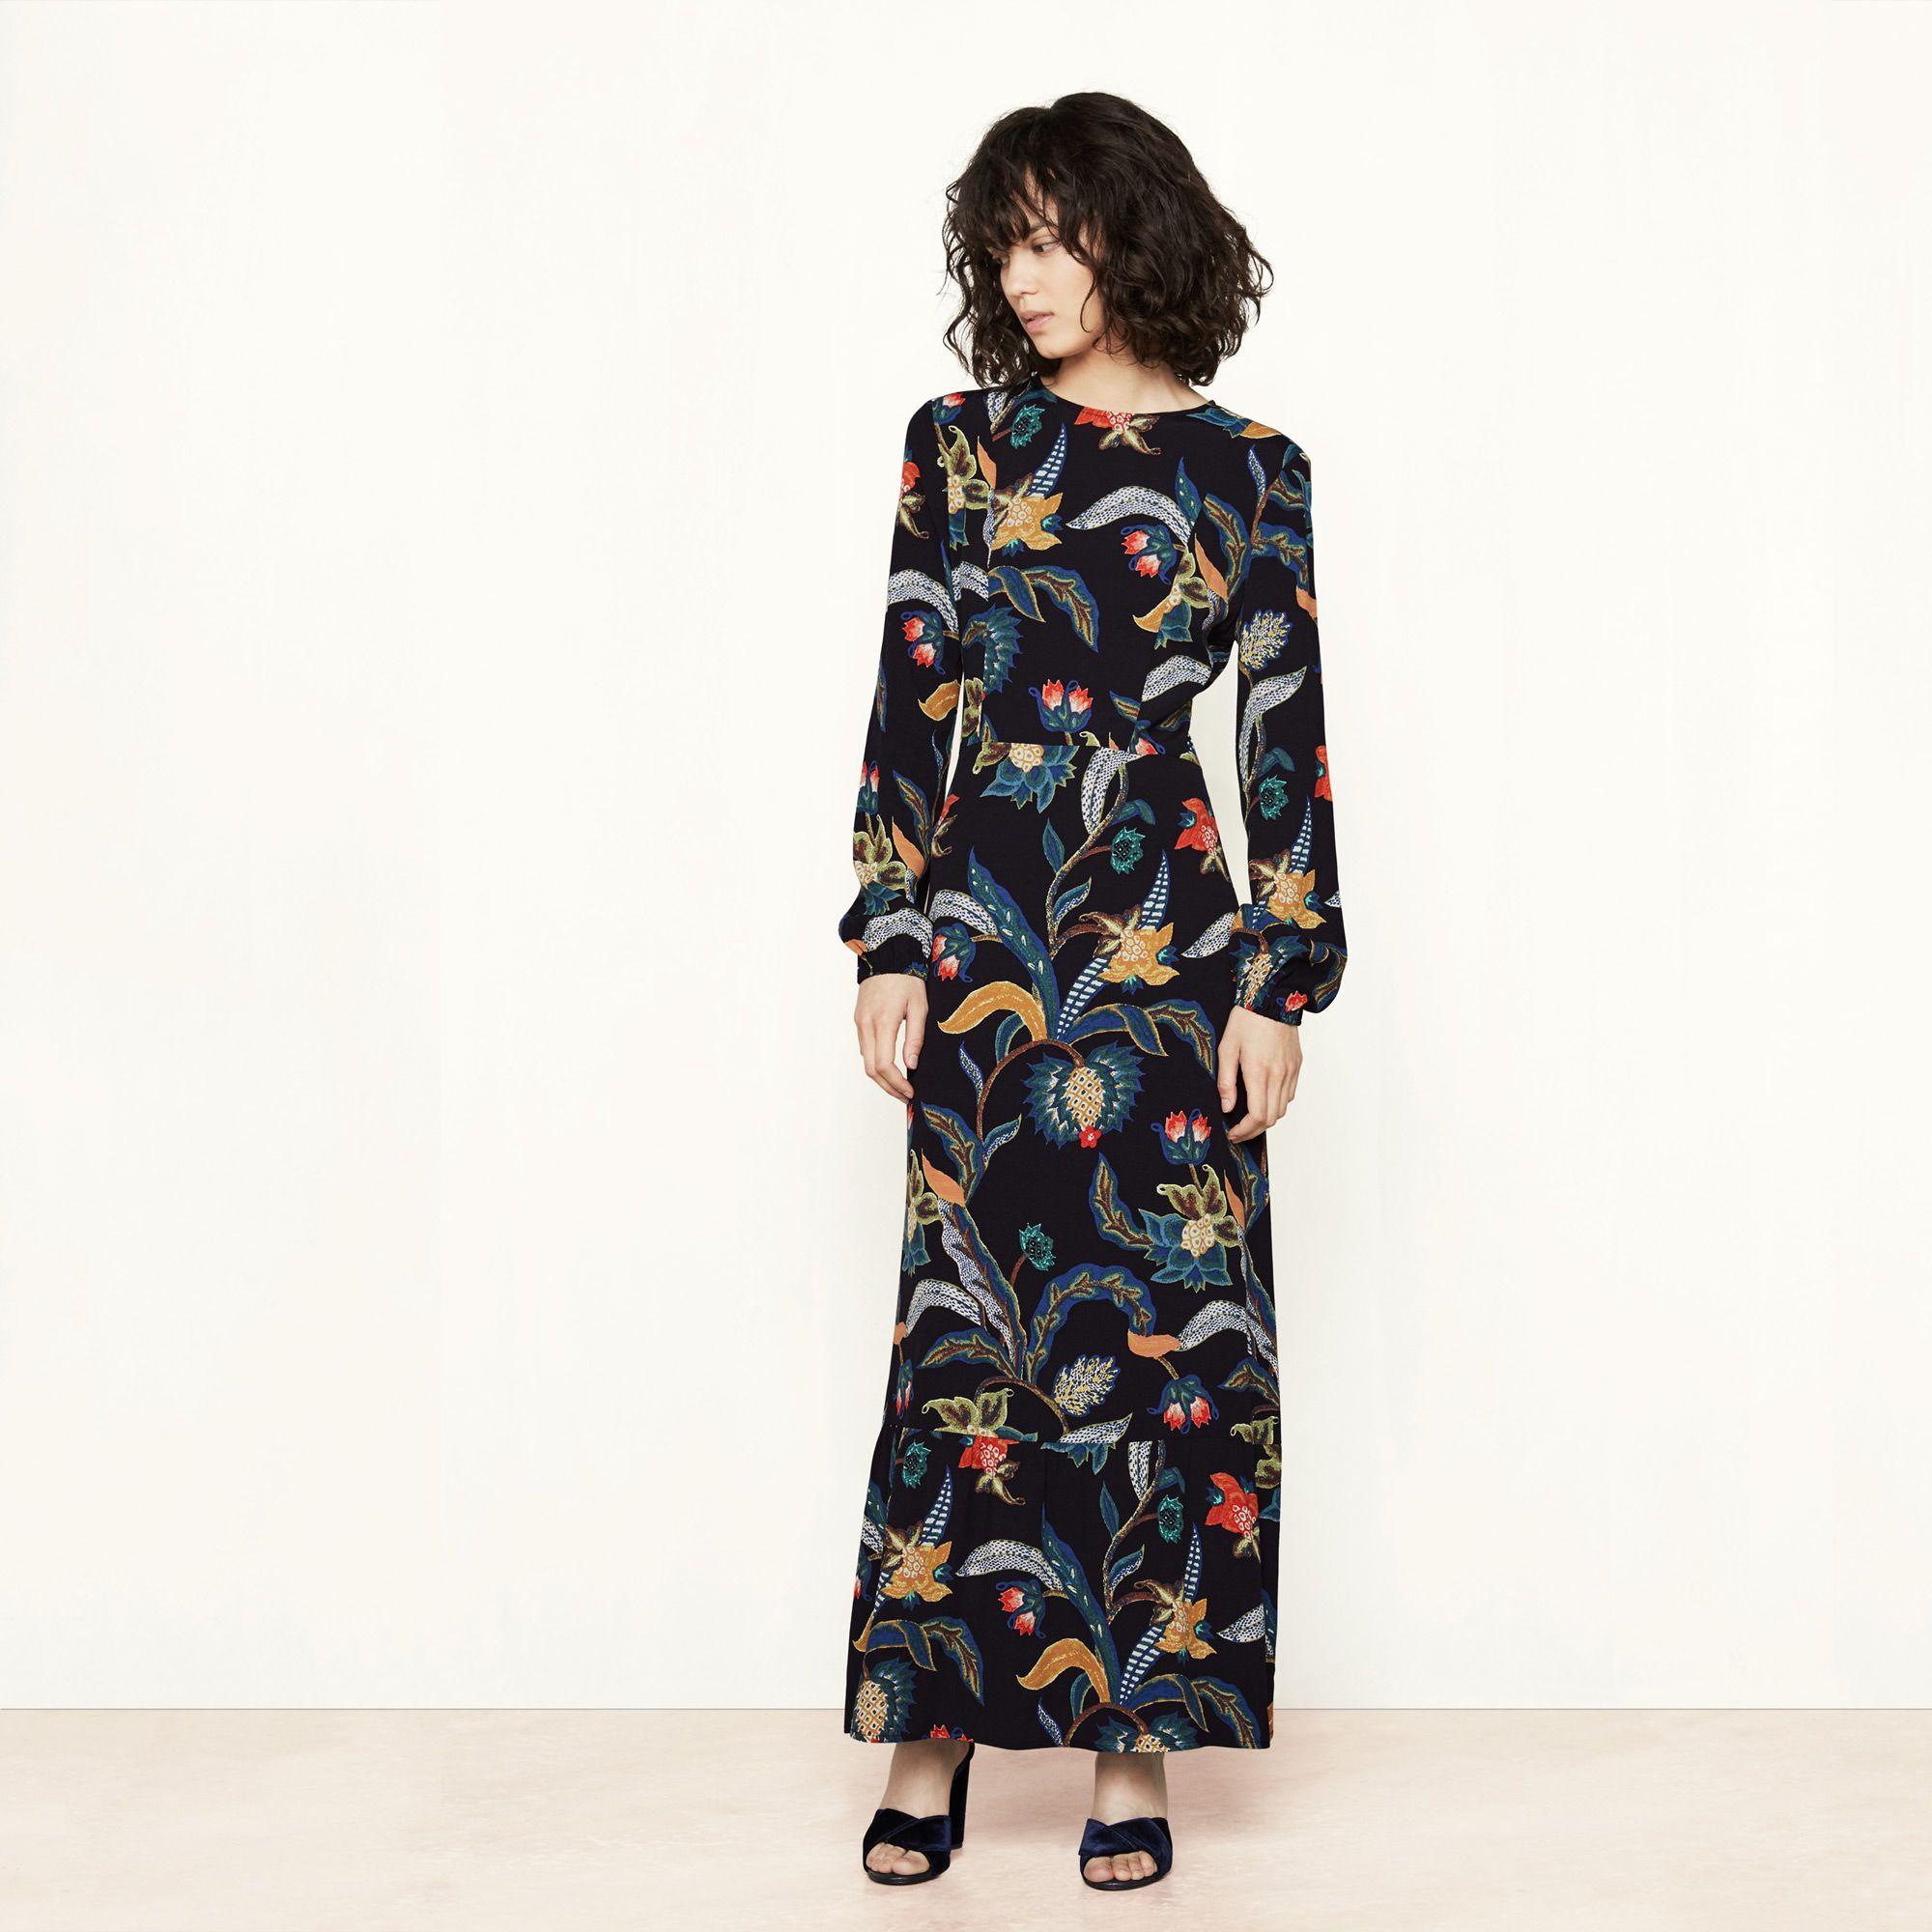 c1832954ac1a7 ROUSSEAU dress, Maje signature theme Baroque, FW16     style lust ...